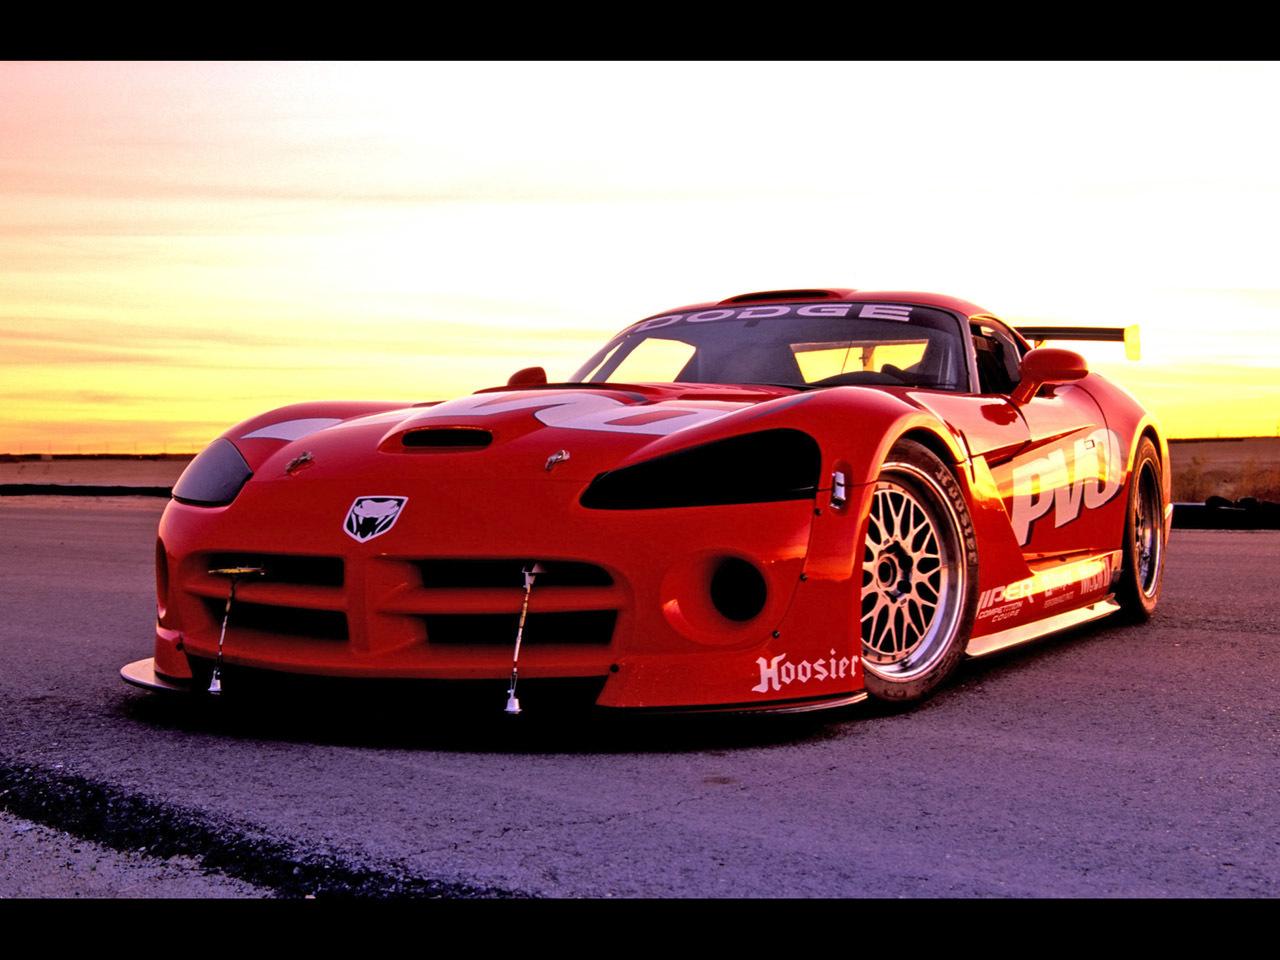 Viper Sports  on Cars Sports Vehicles Dodge Viper Car Hd Wallpaper   Sport   Health